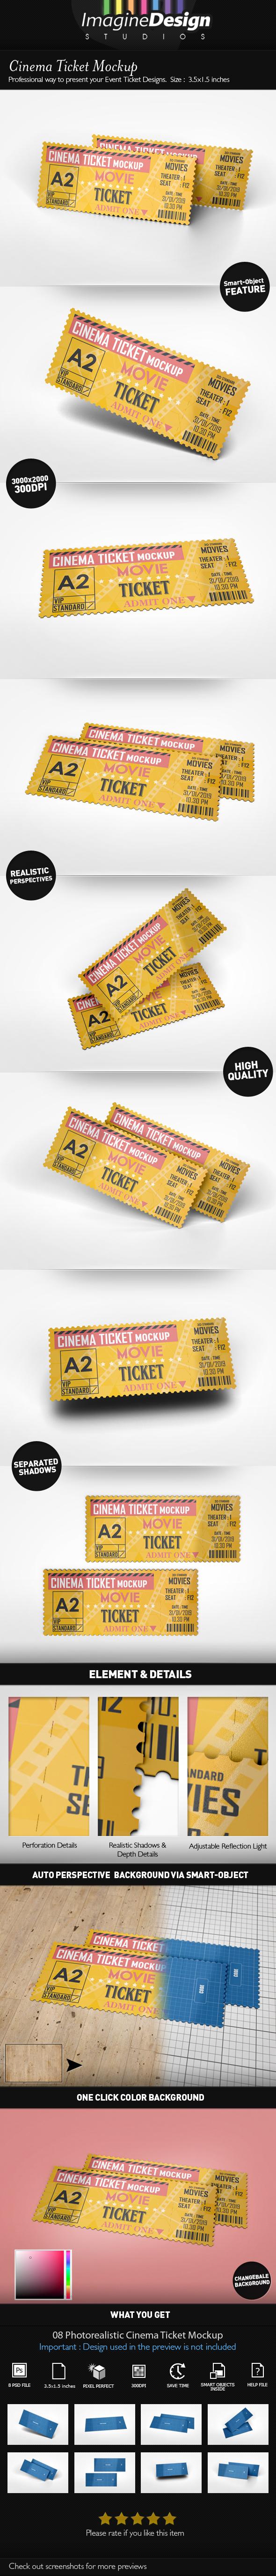 Cinema Ticket Mockup by idesignstudio